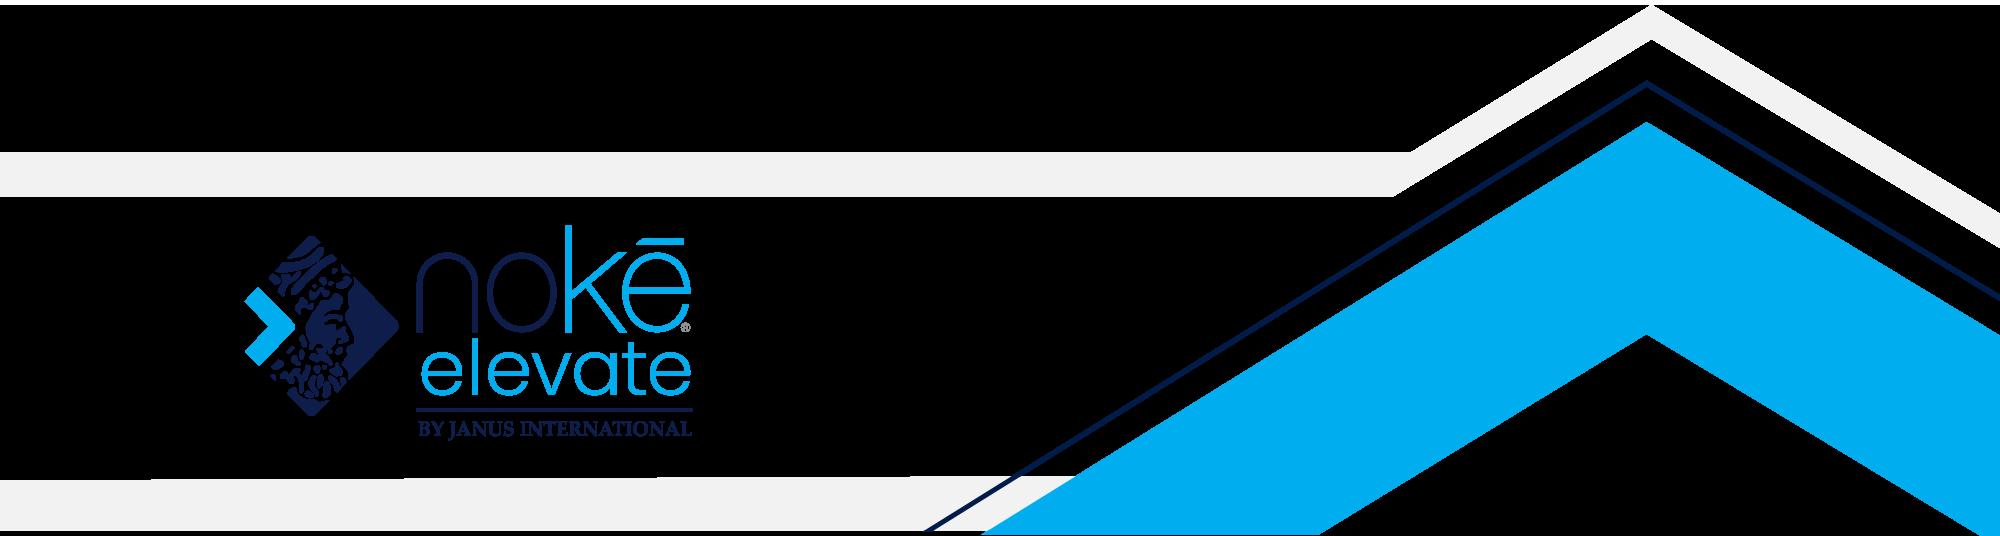 Noke_Elevate_WebHeader (002)